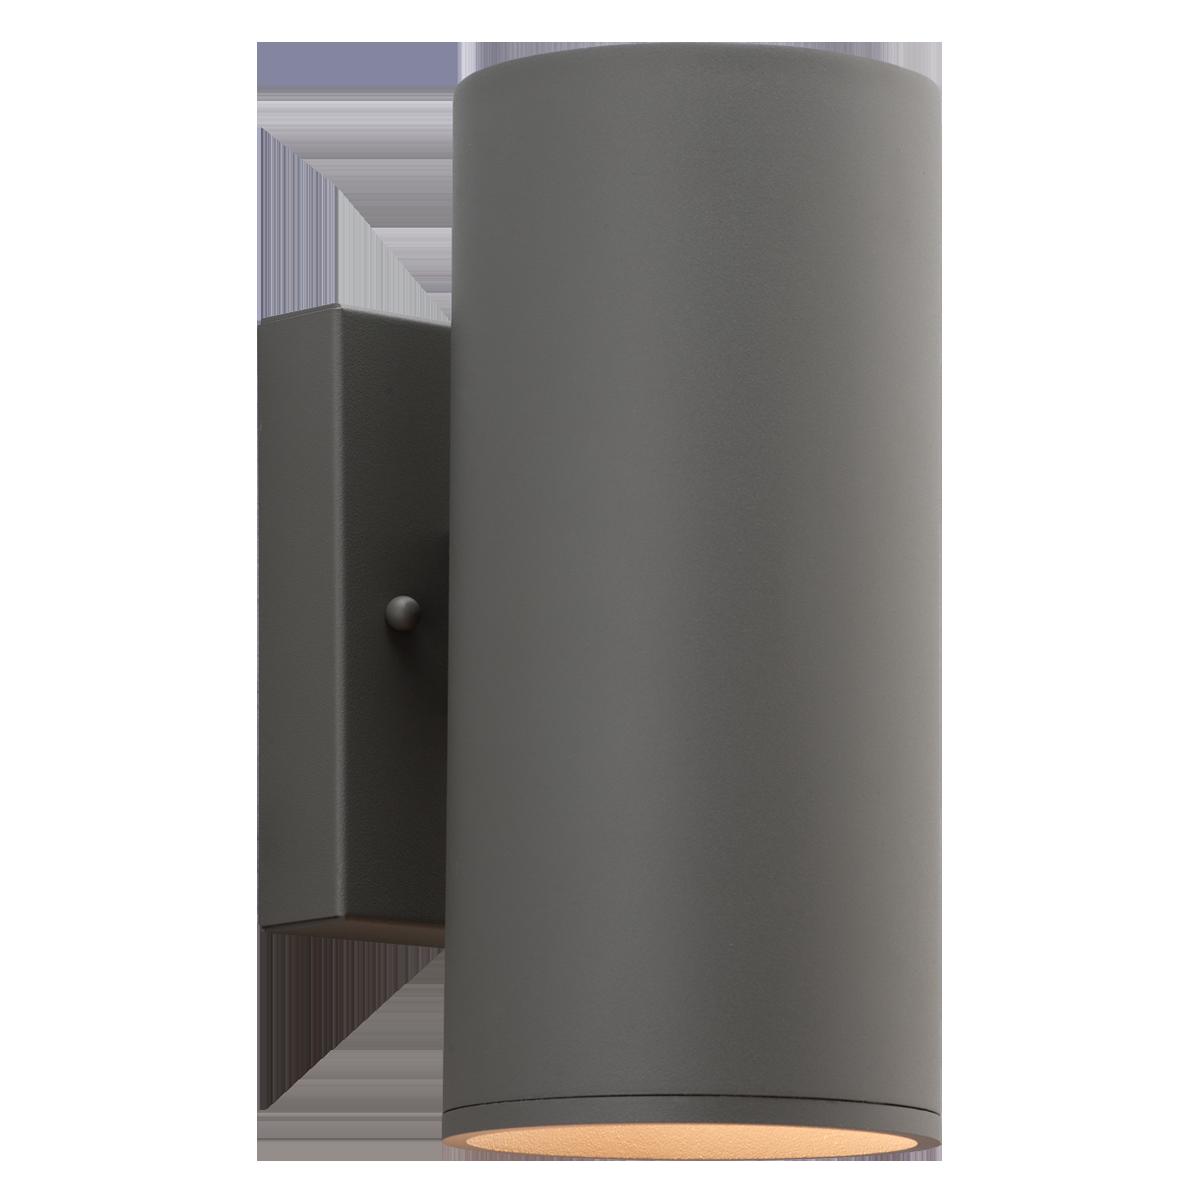 "5"" Round LED Wall Mount Downlight Cylinder, 3000K  -  90 CRI"